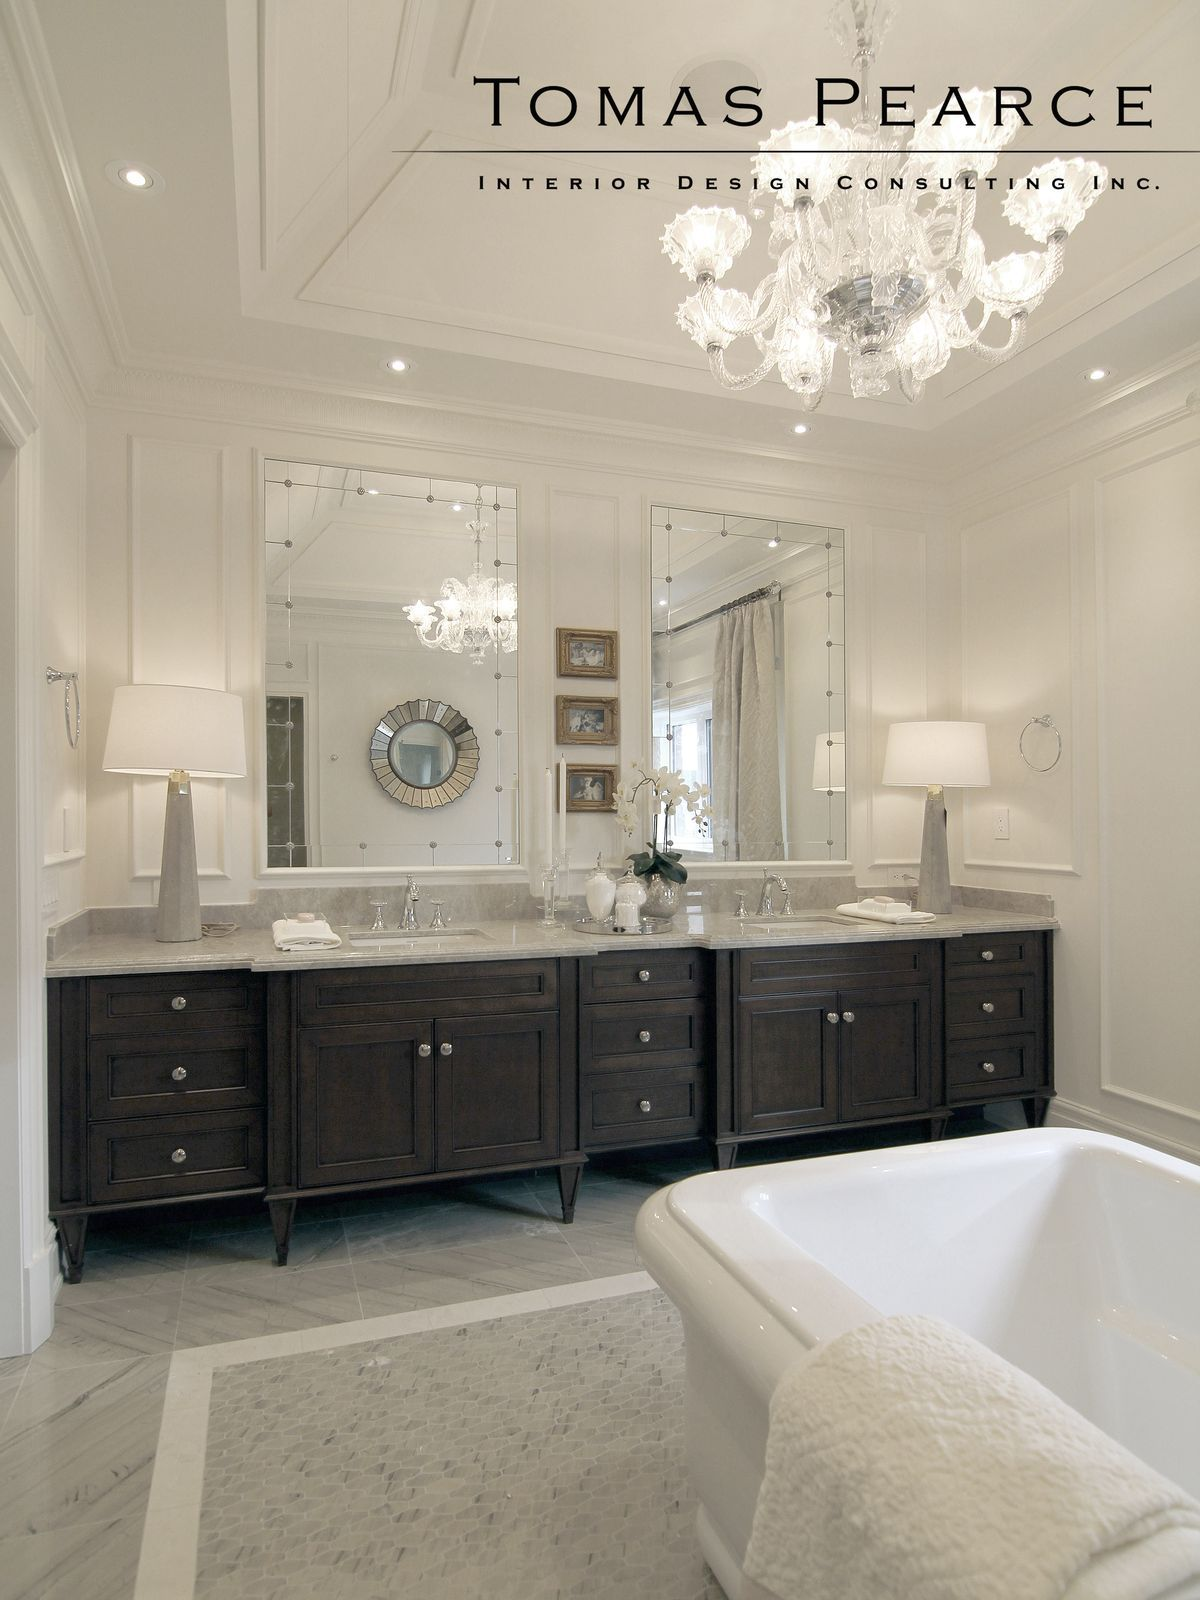 UltraModern Luxury Bathroom Designs Bathroom designs